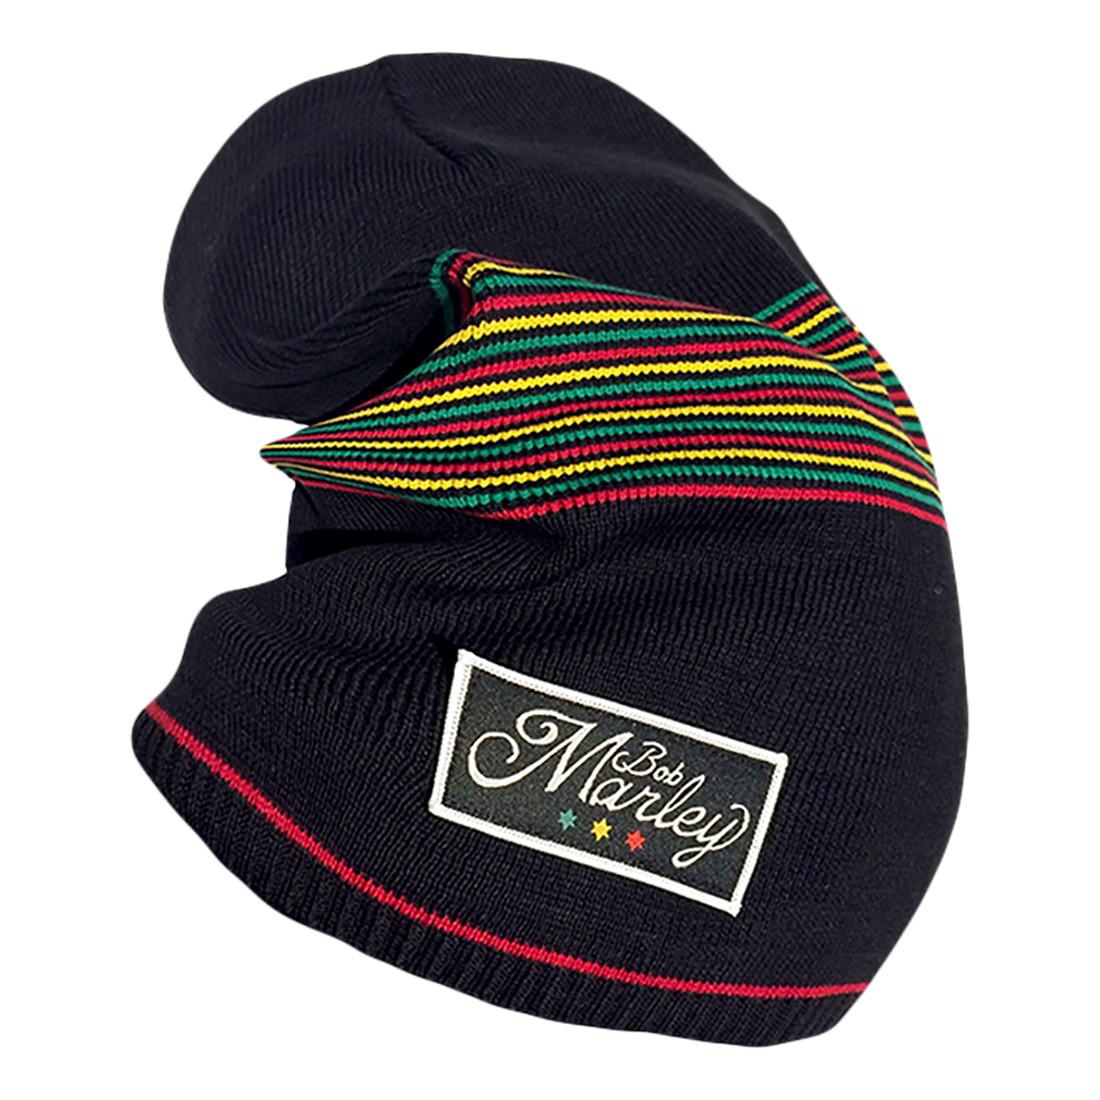 Marley Rasta Stripe Tam